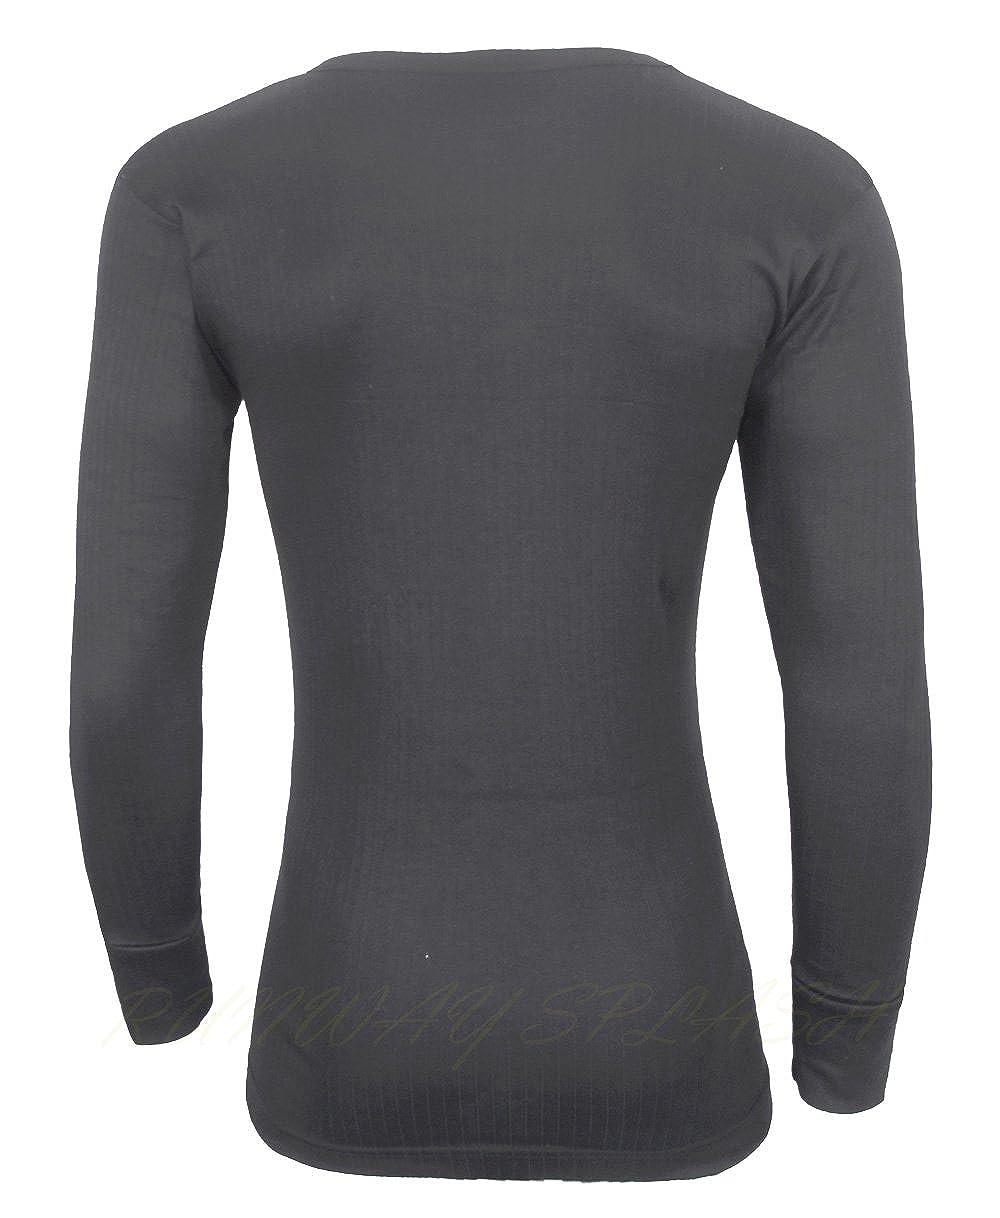 Mens Gents Inner Thermal Underwear T Shirt Short Sleeved Vest Top Size M L XL